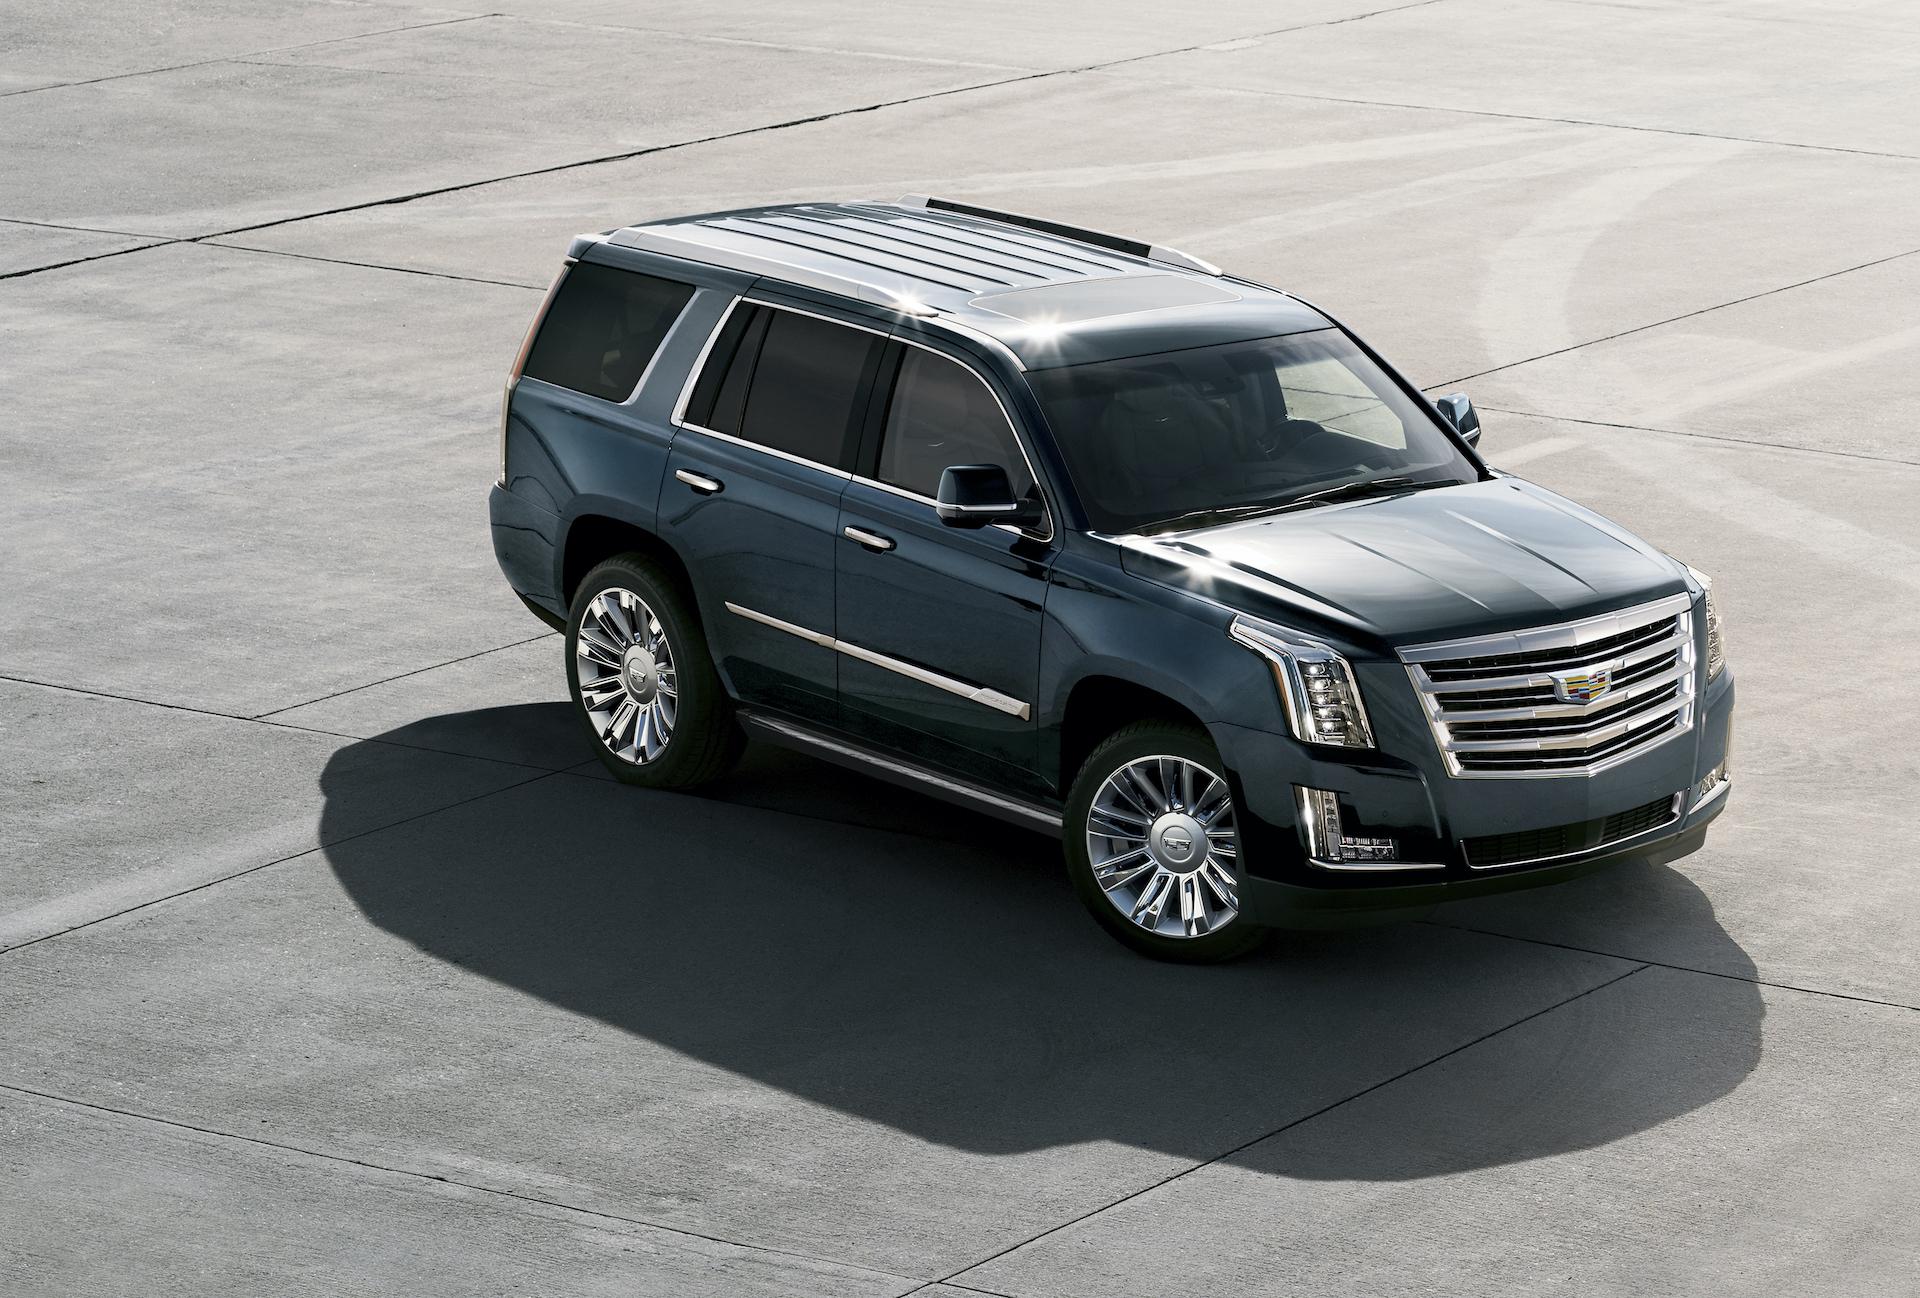 38 All New Price Of 2020 Cadillac Escalade Configurations for Price Of 2020 Cadillac Escalade